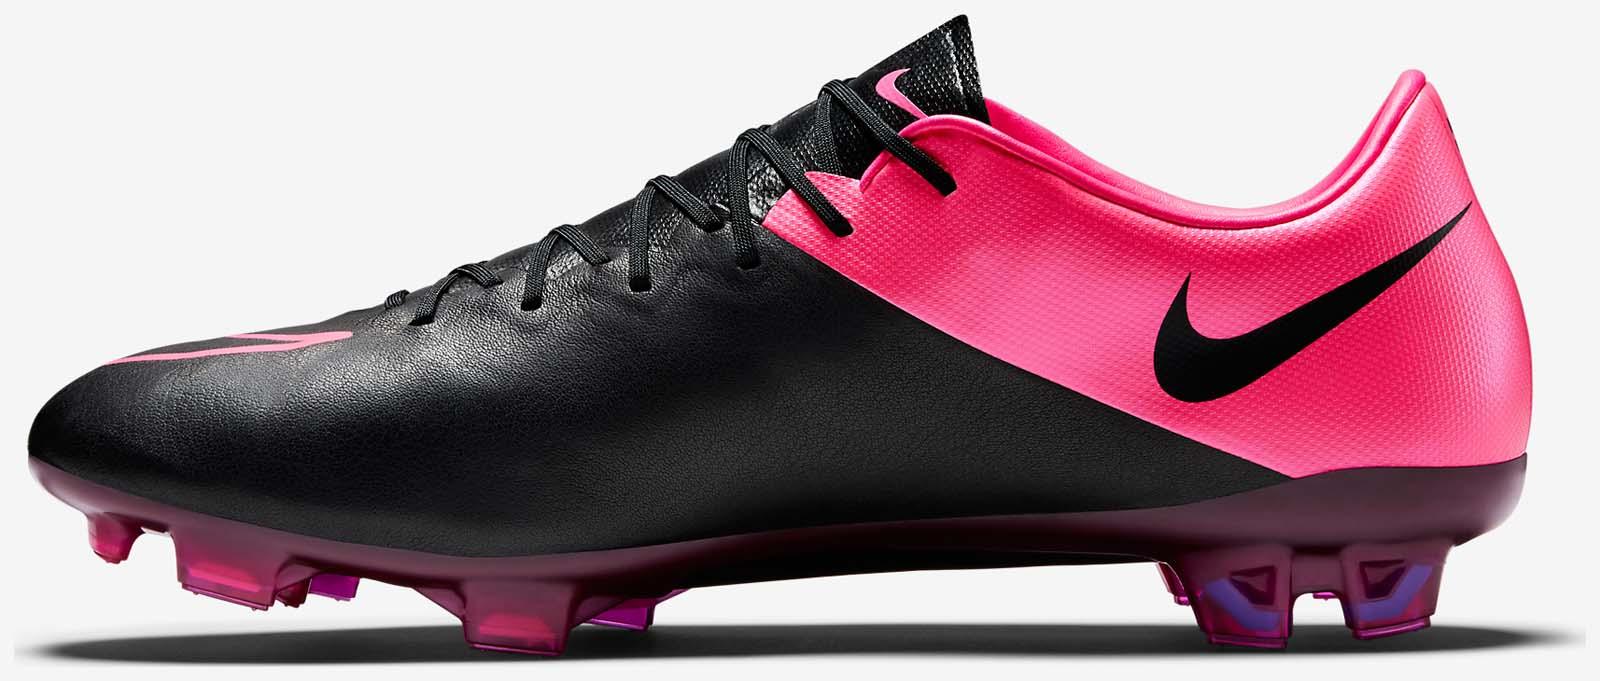 ee2efa2dce4c ... top quality pink vapor 10. nike mercurial vapor x 8171a 36c4c